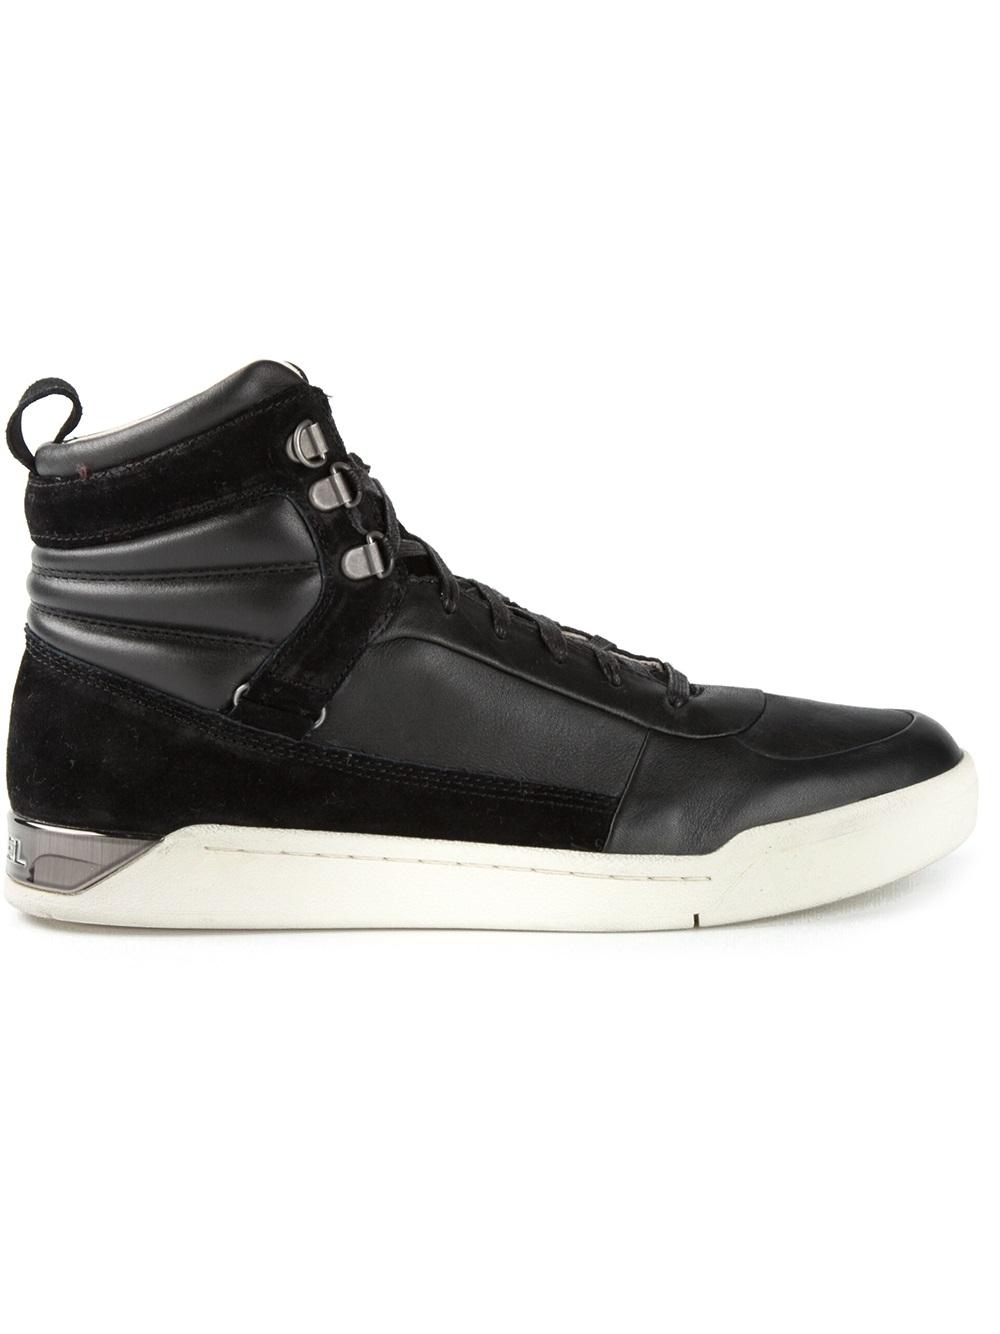 Diesel Avenue Shoes Black